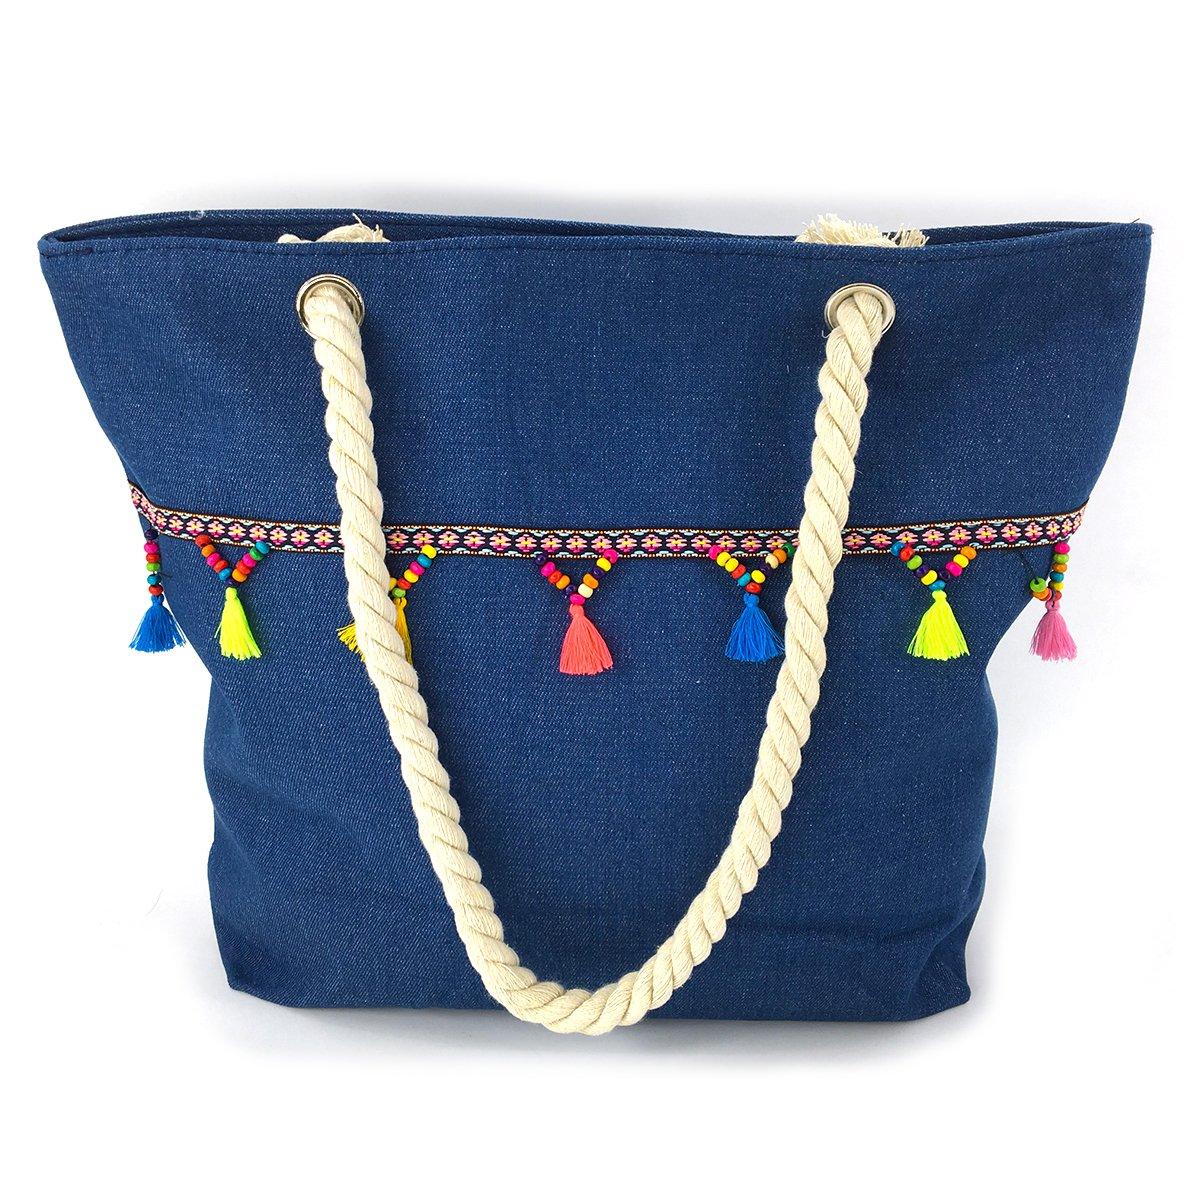 We We Fashion Bohemia Jean Beach Bag Waterproof Canvas Tote Bag - Large (Style 08)